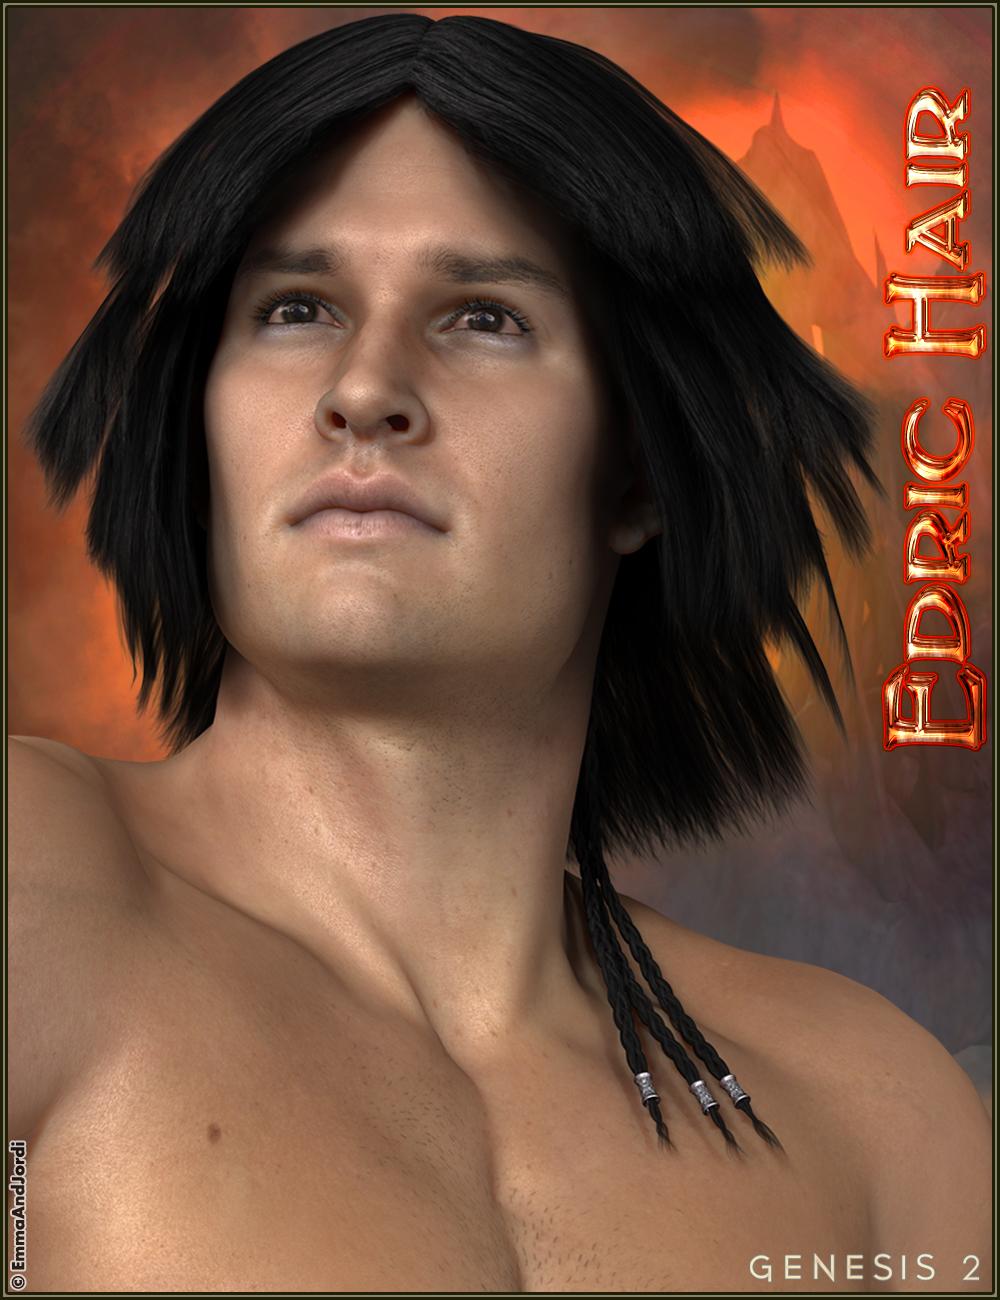 Edric Hair by: EmmaAndJordi, 3D Models by Daz 3D